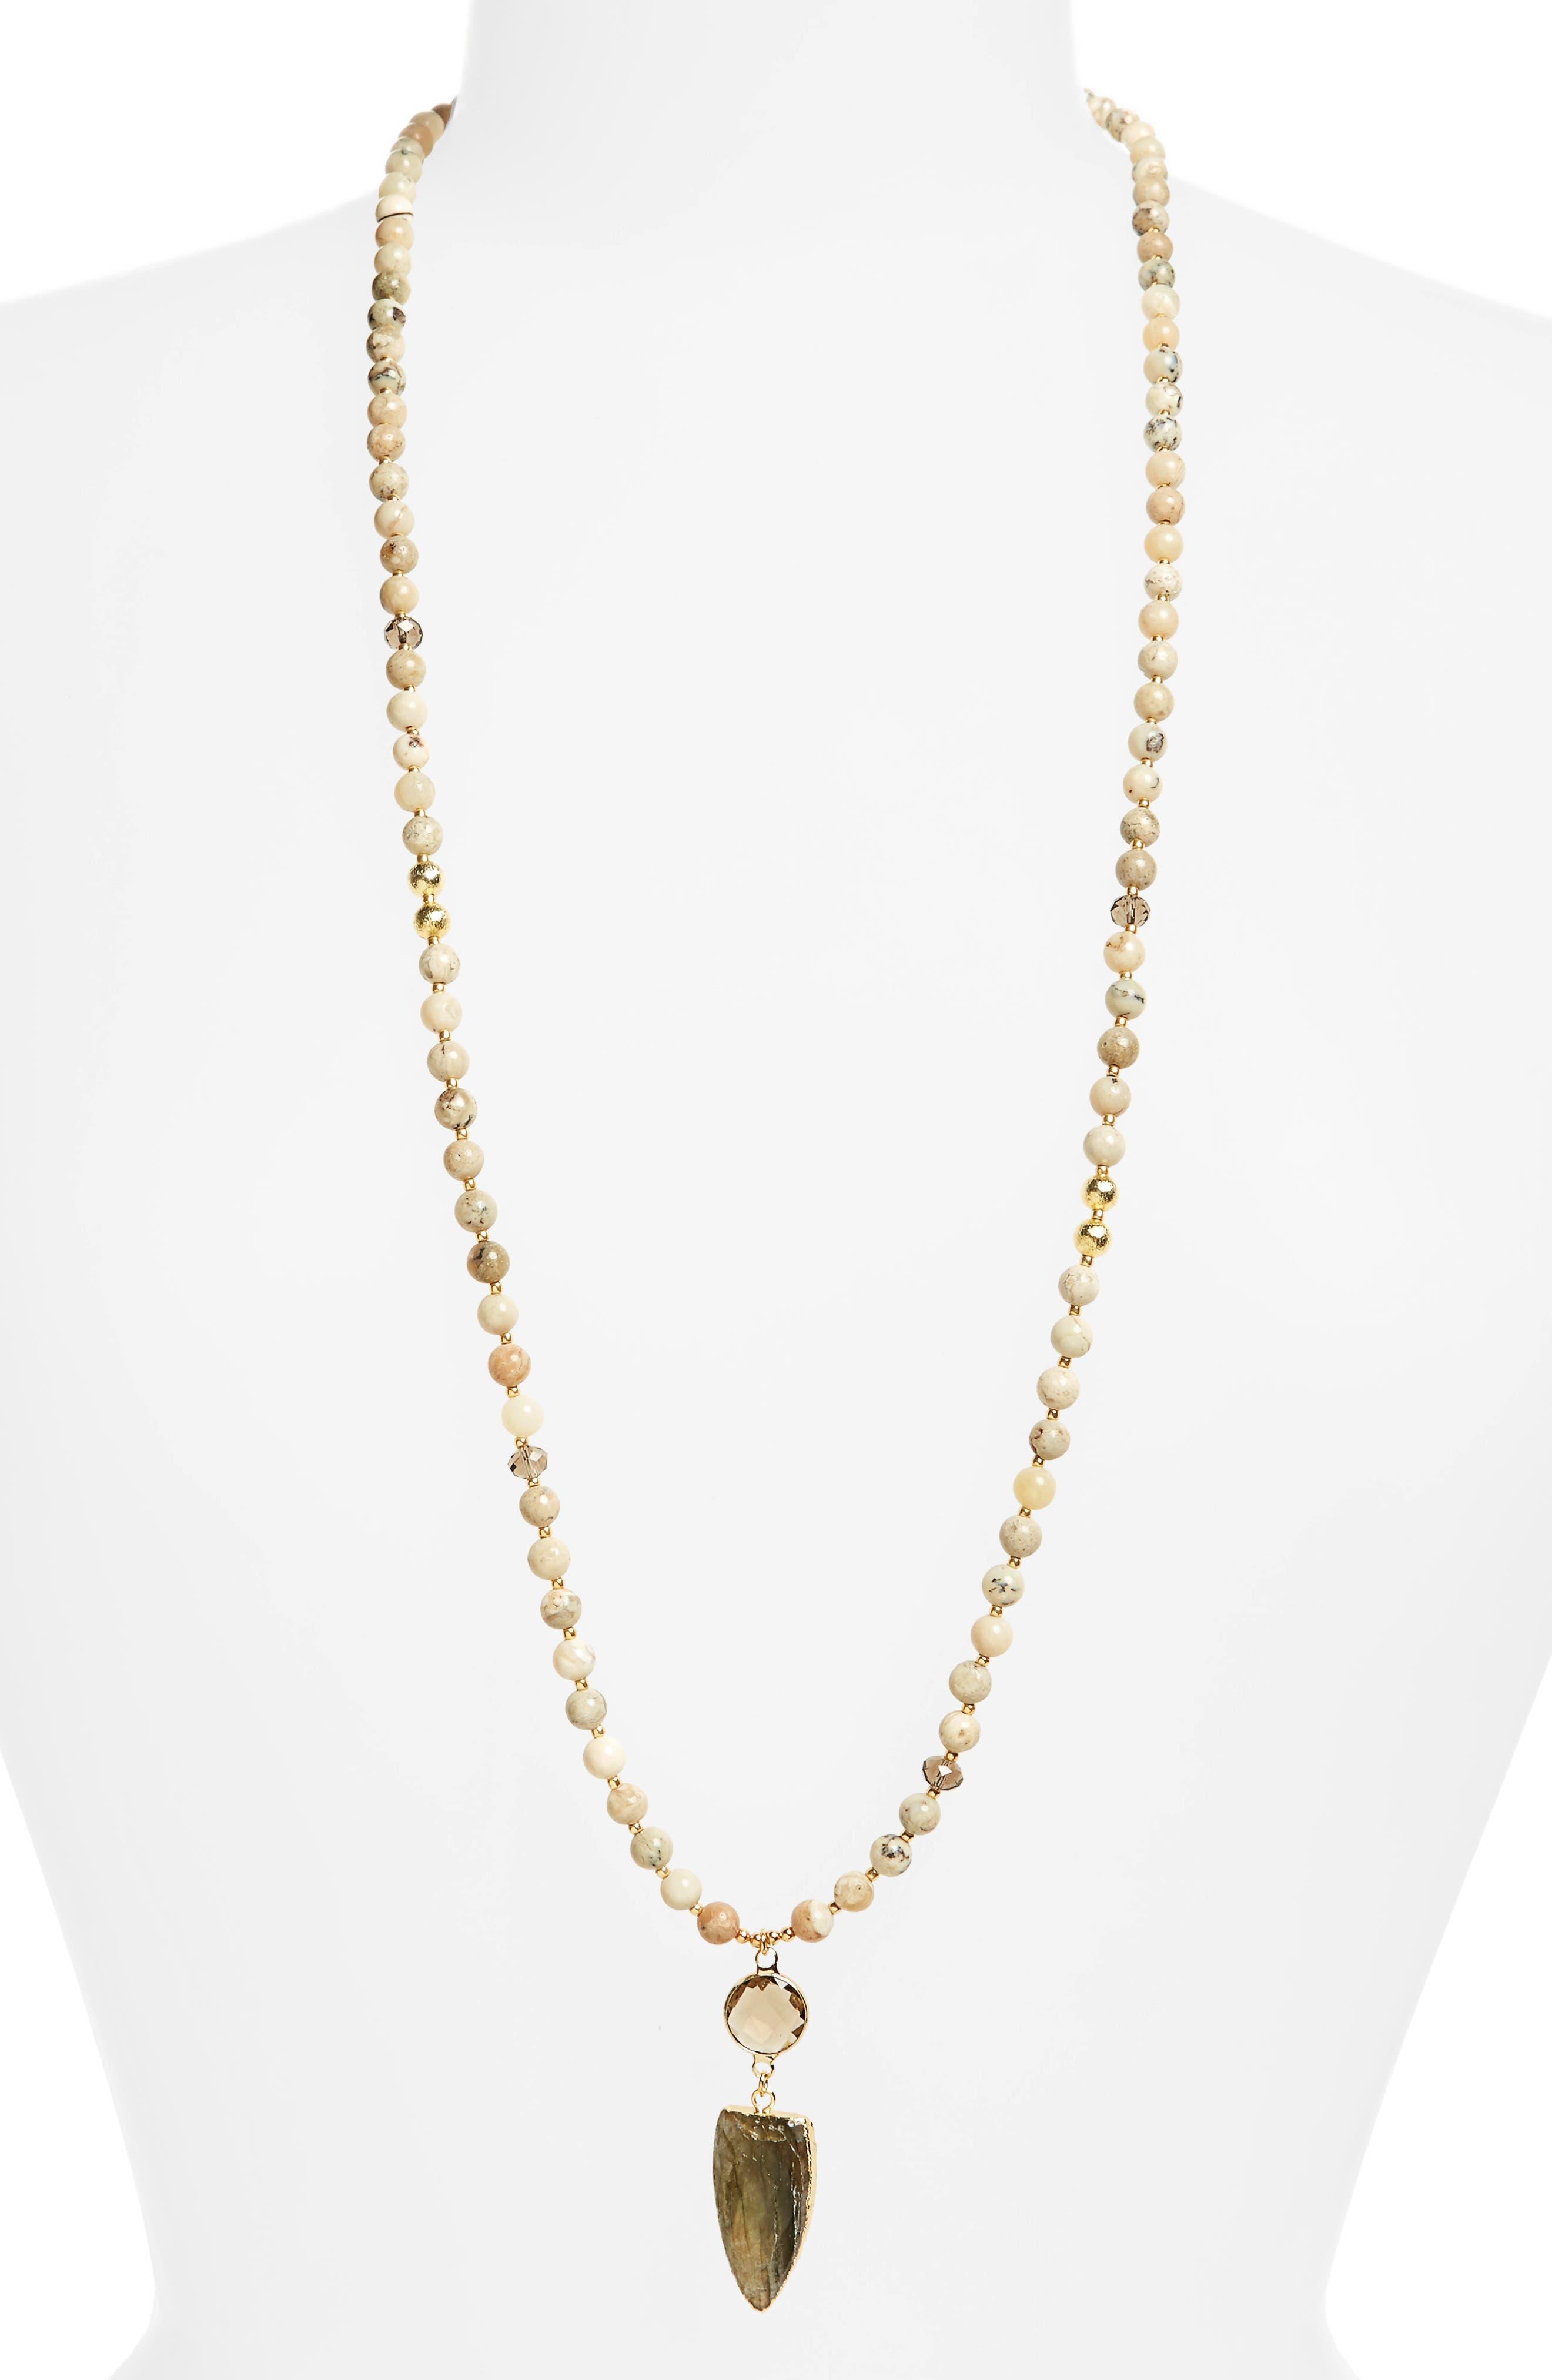 Main Image - Love's Affect Sadie Semiprecious Pendant Necklace